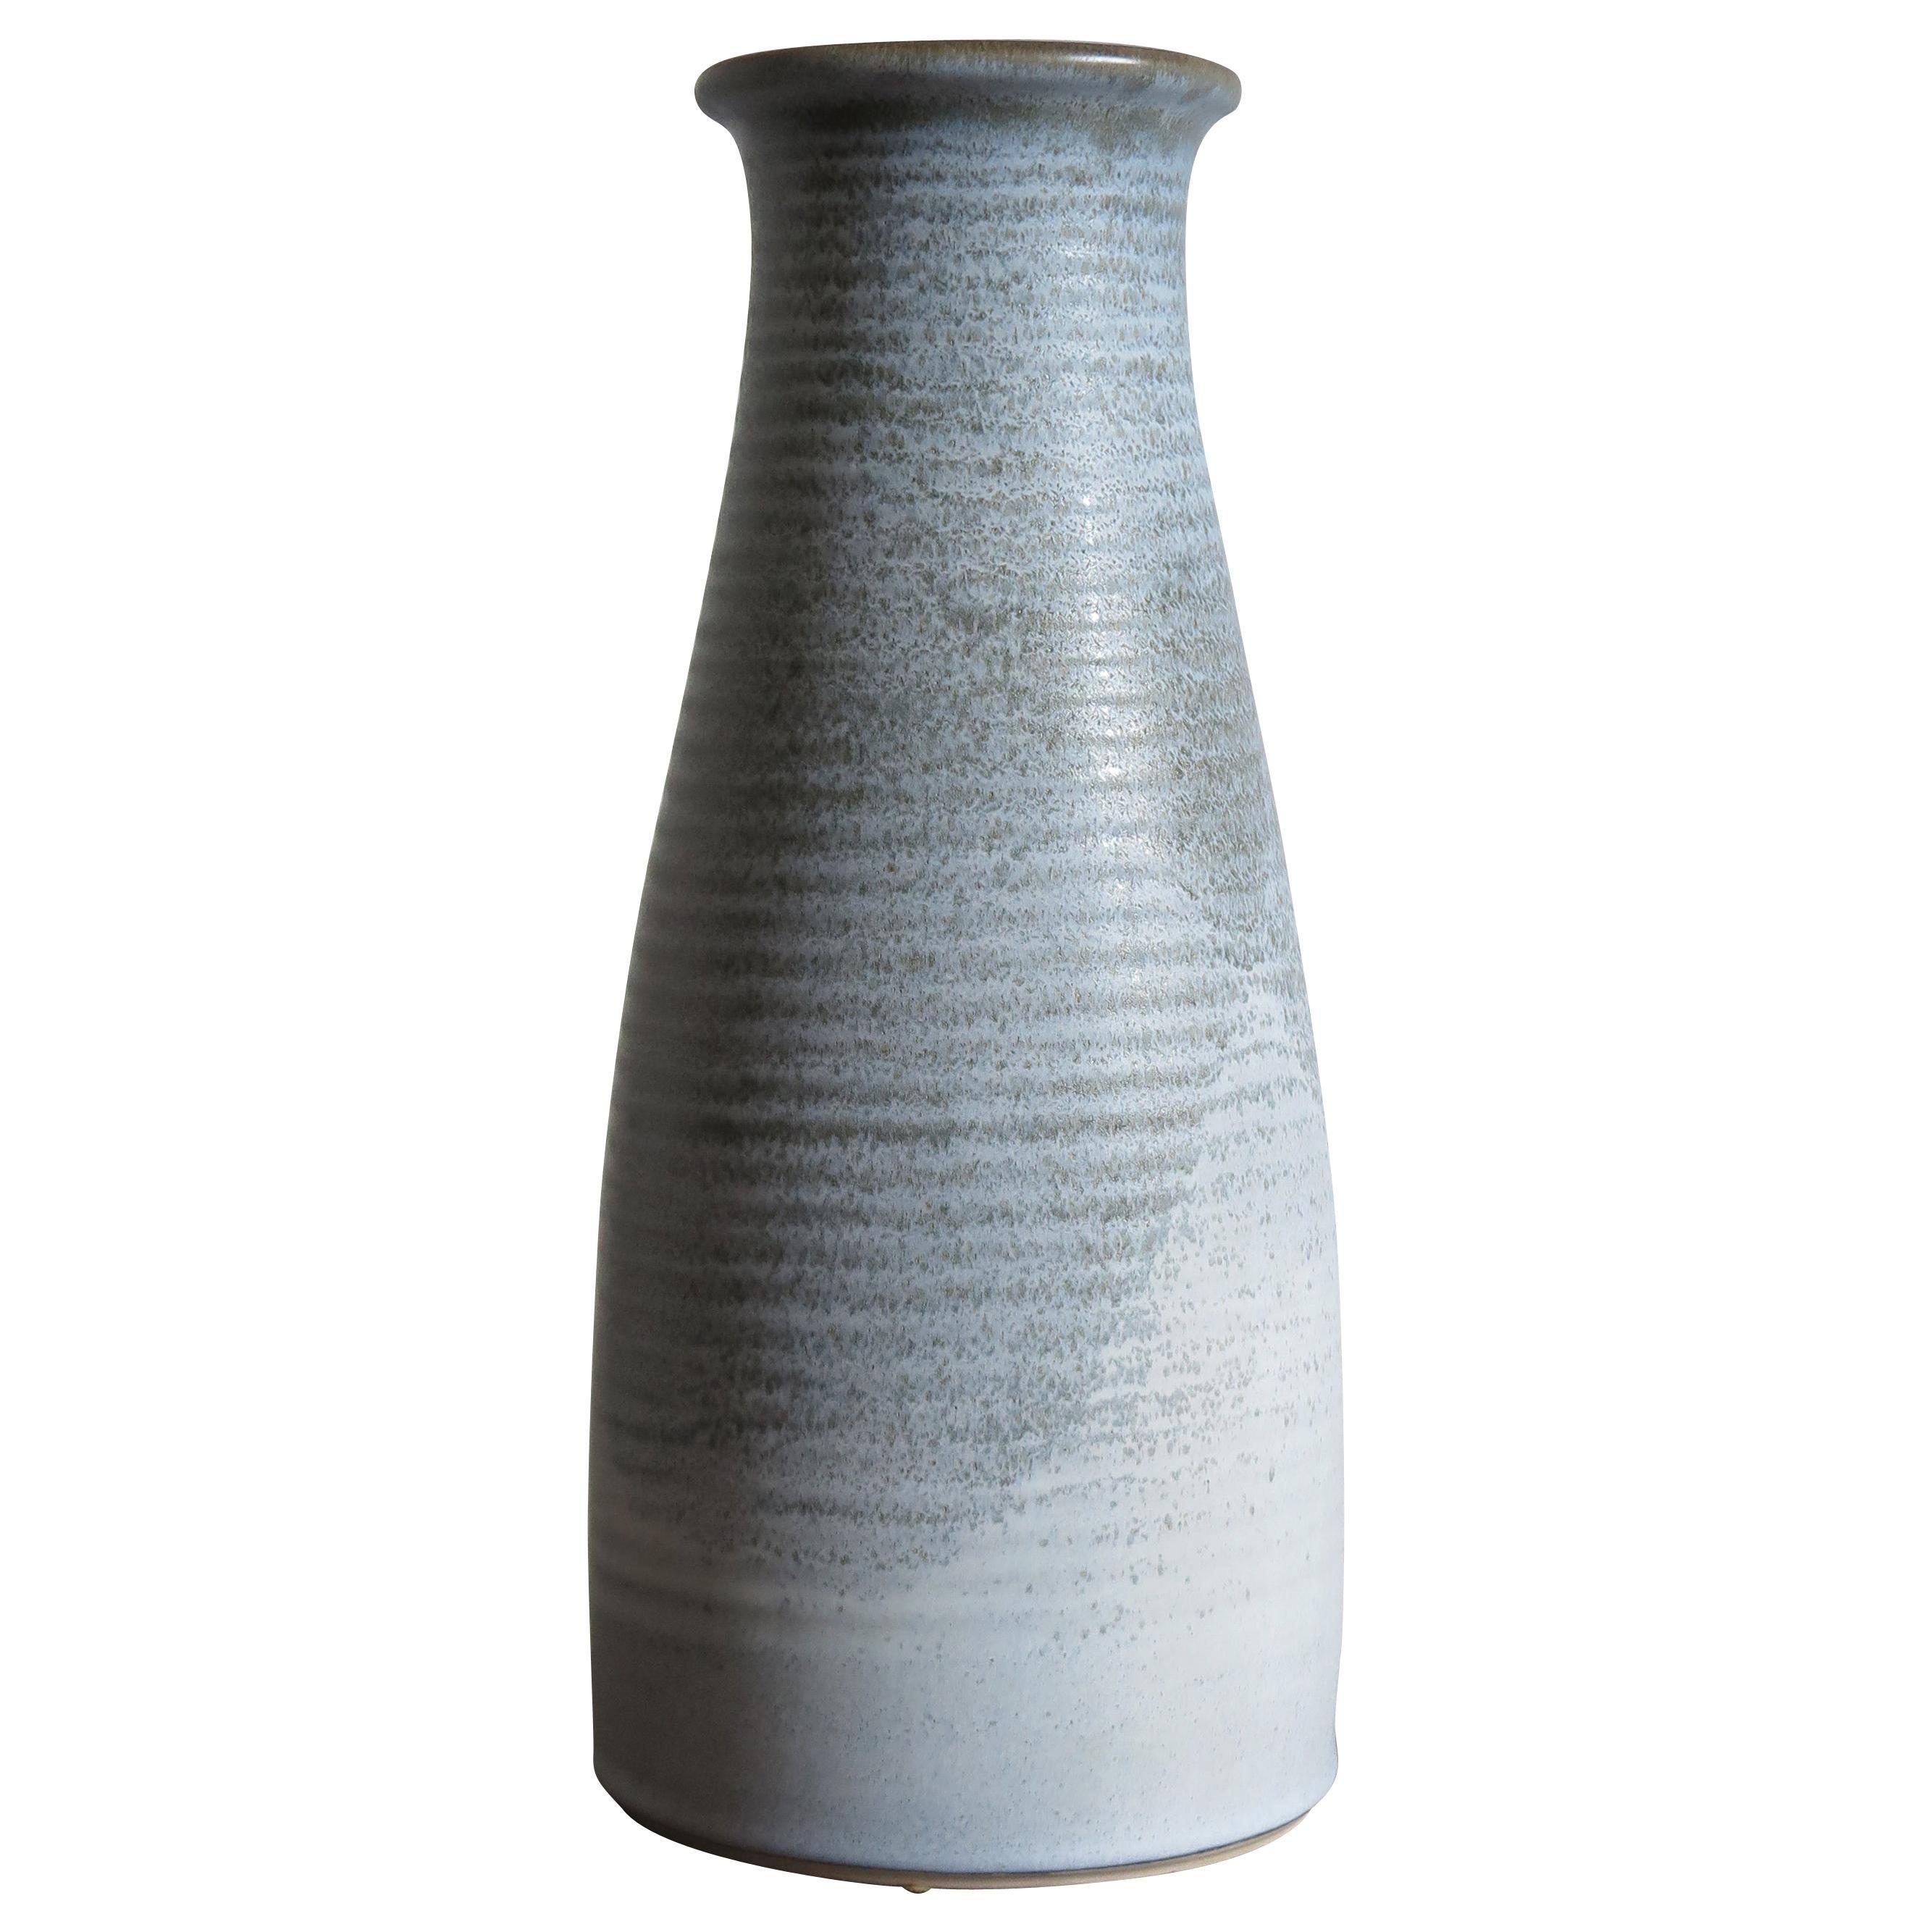 Franco Bucci Italian Mid-Century Modern Gres Pottery Big Vase, 1970s